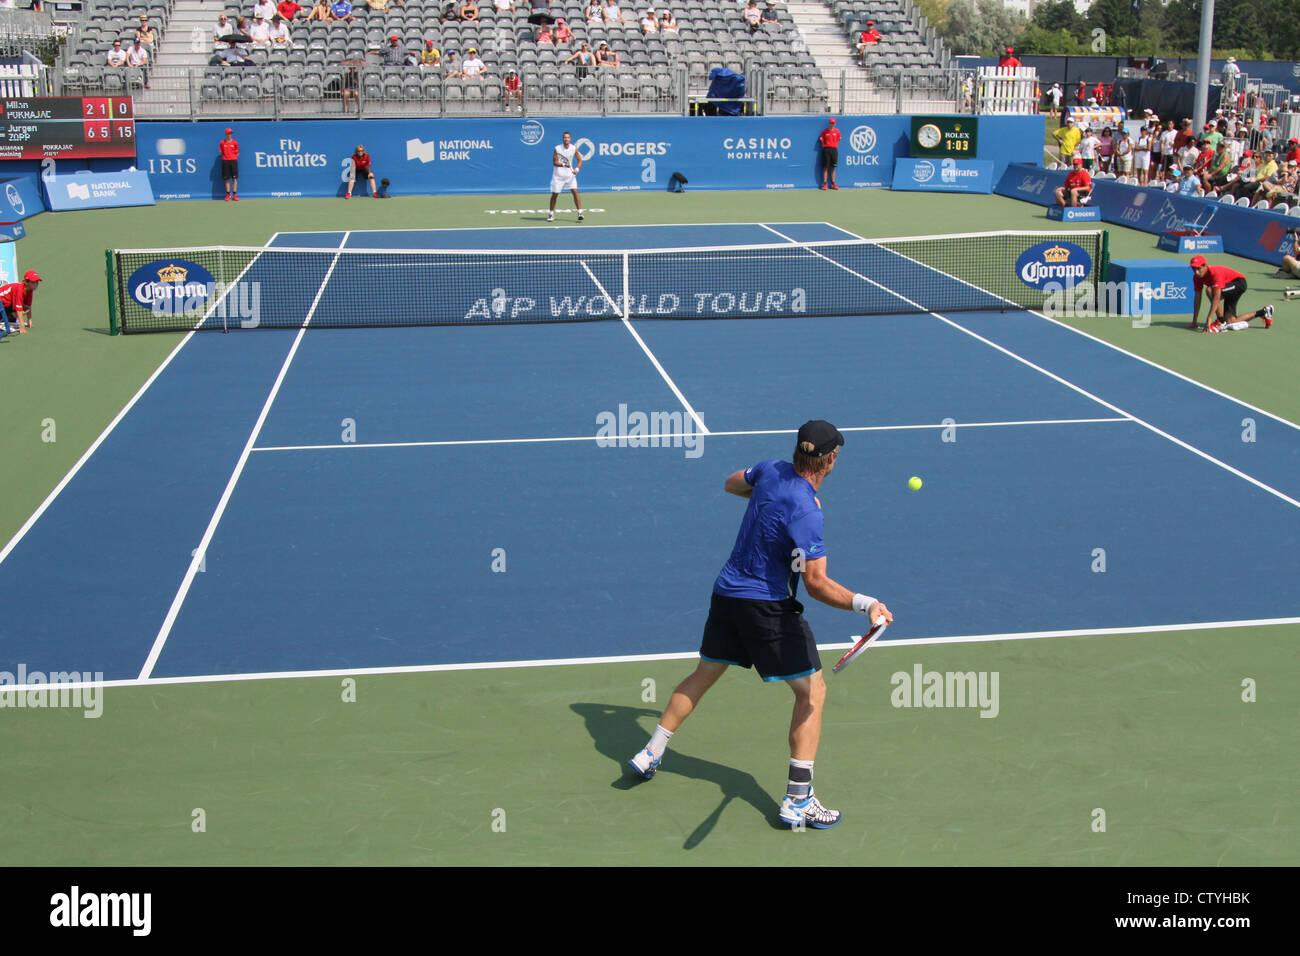 Tennis singles dating uk 9